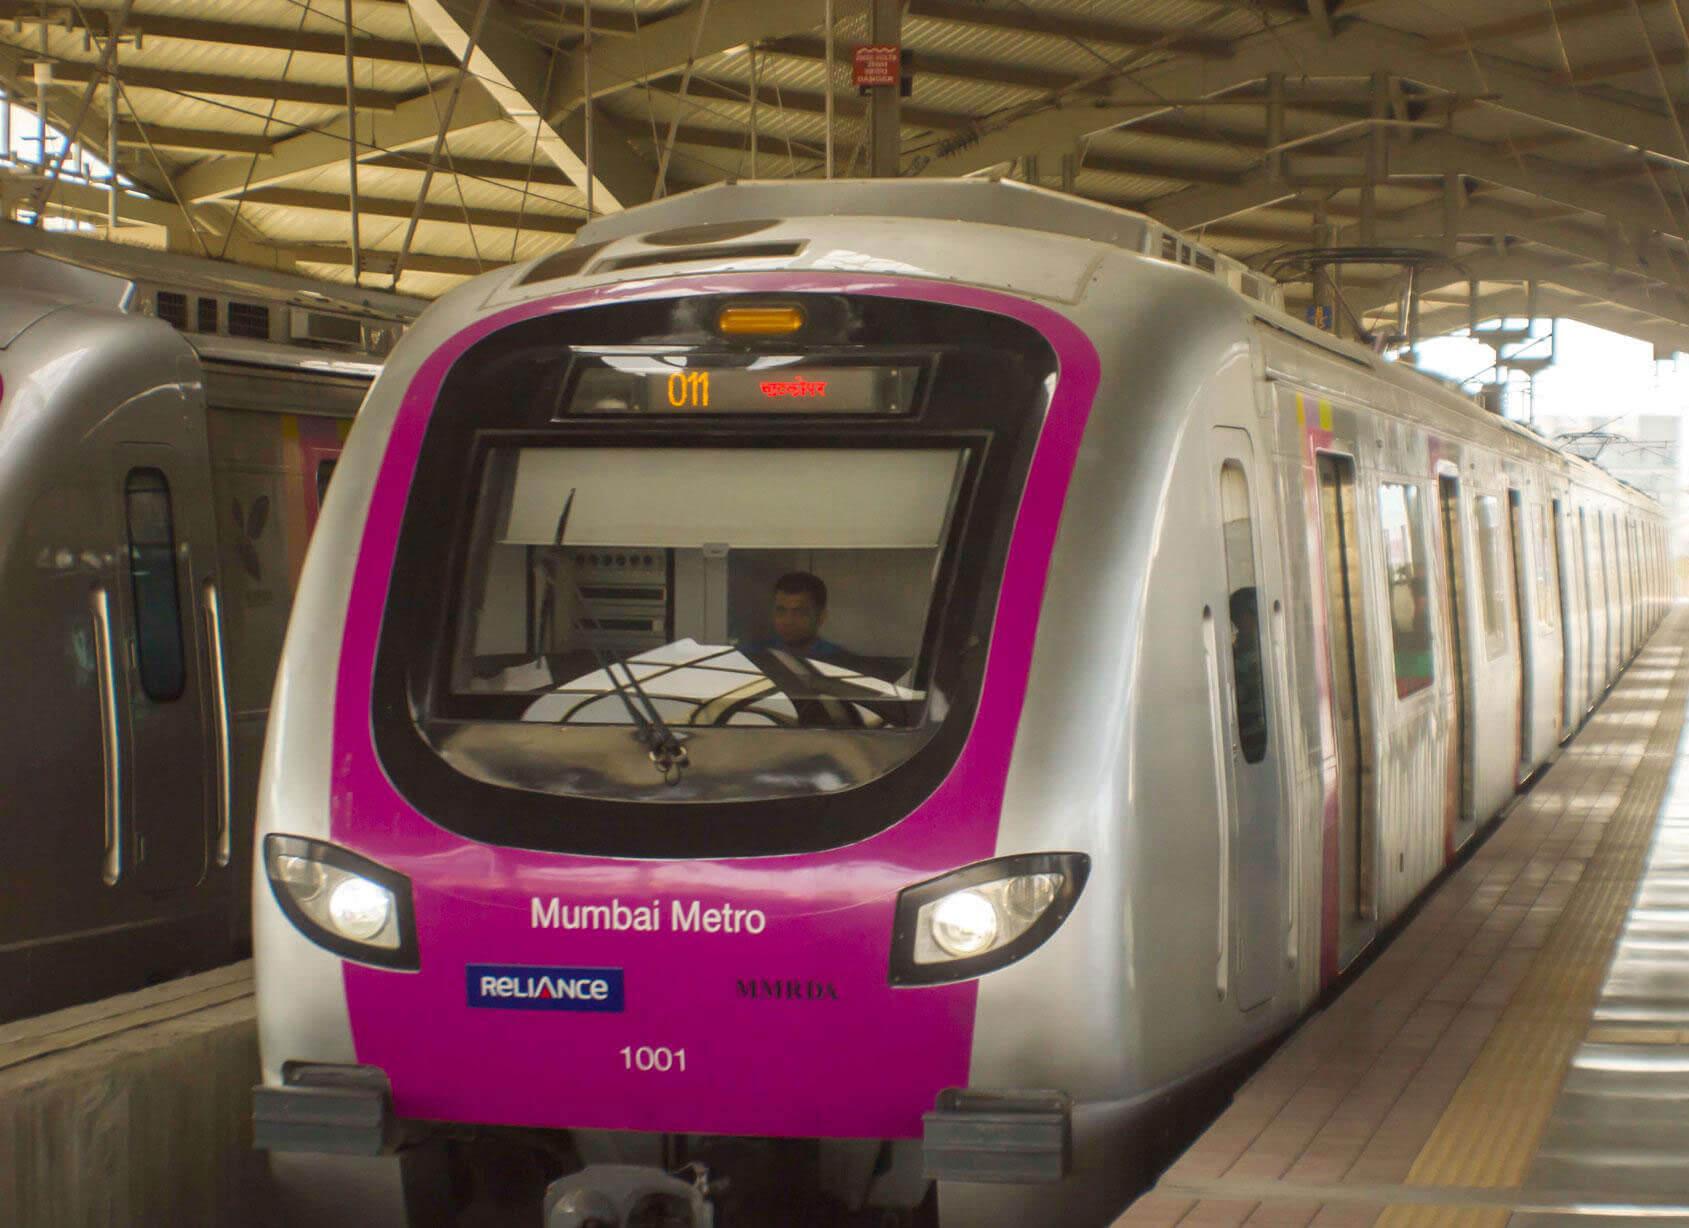 What is common between Taiwan Tourism Bureau and Mumbai metro?